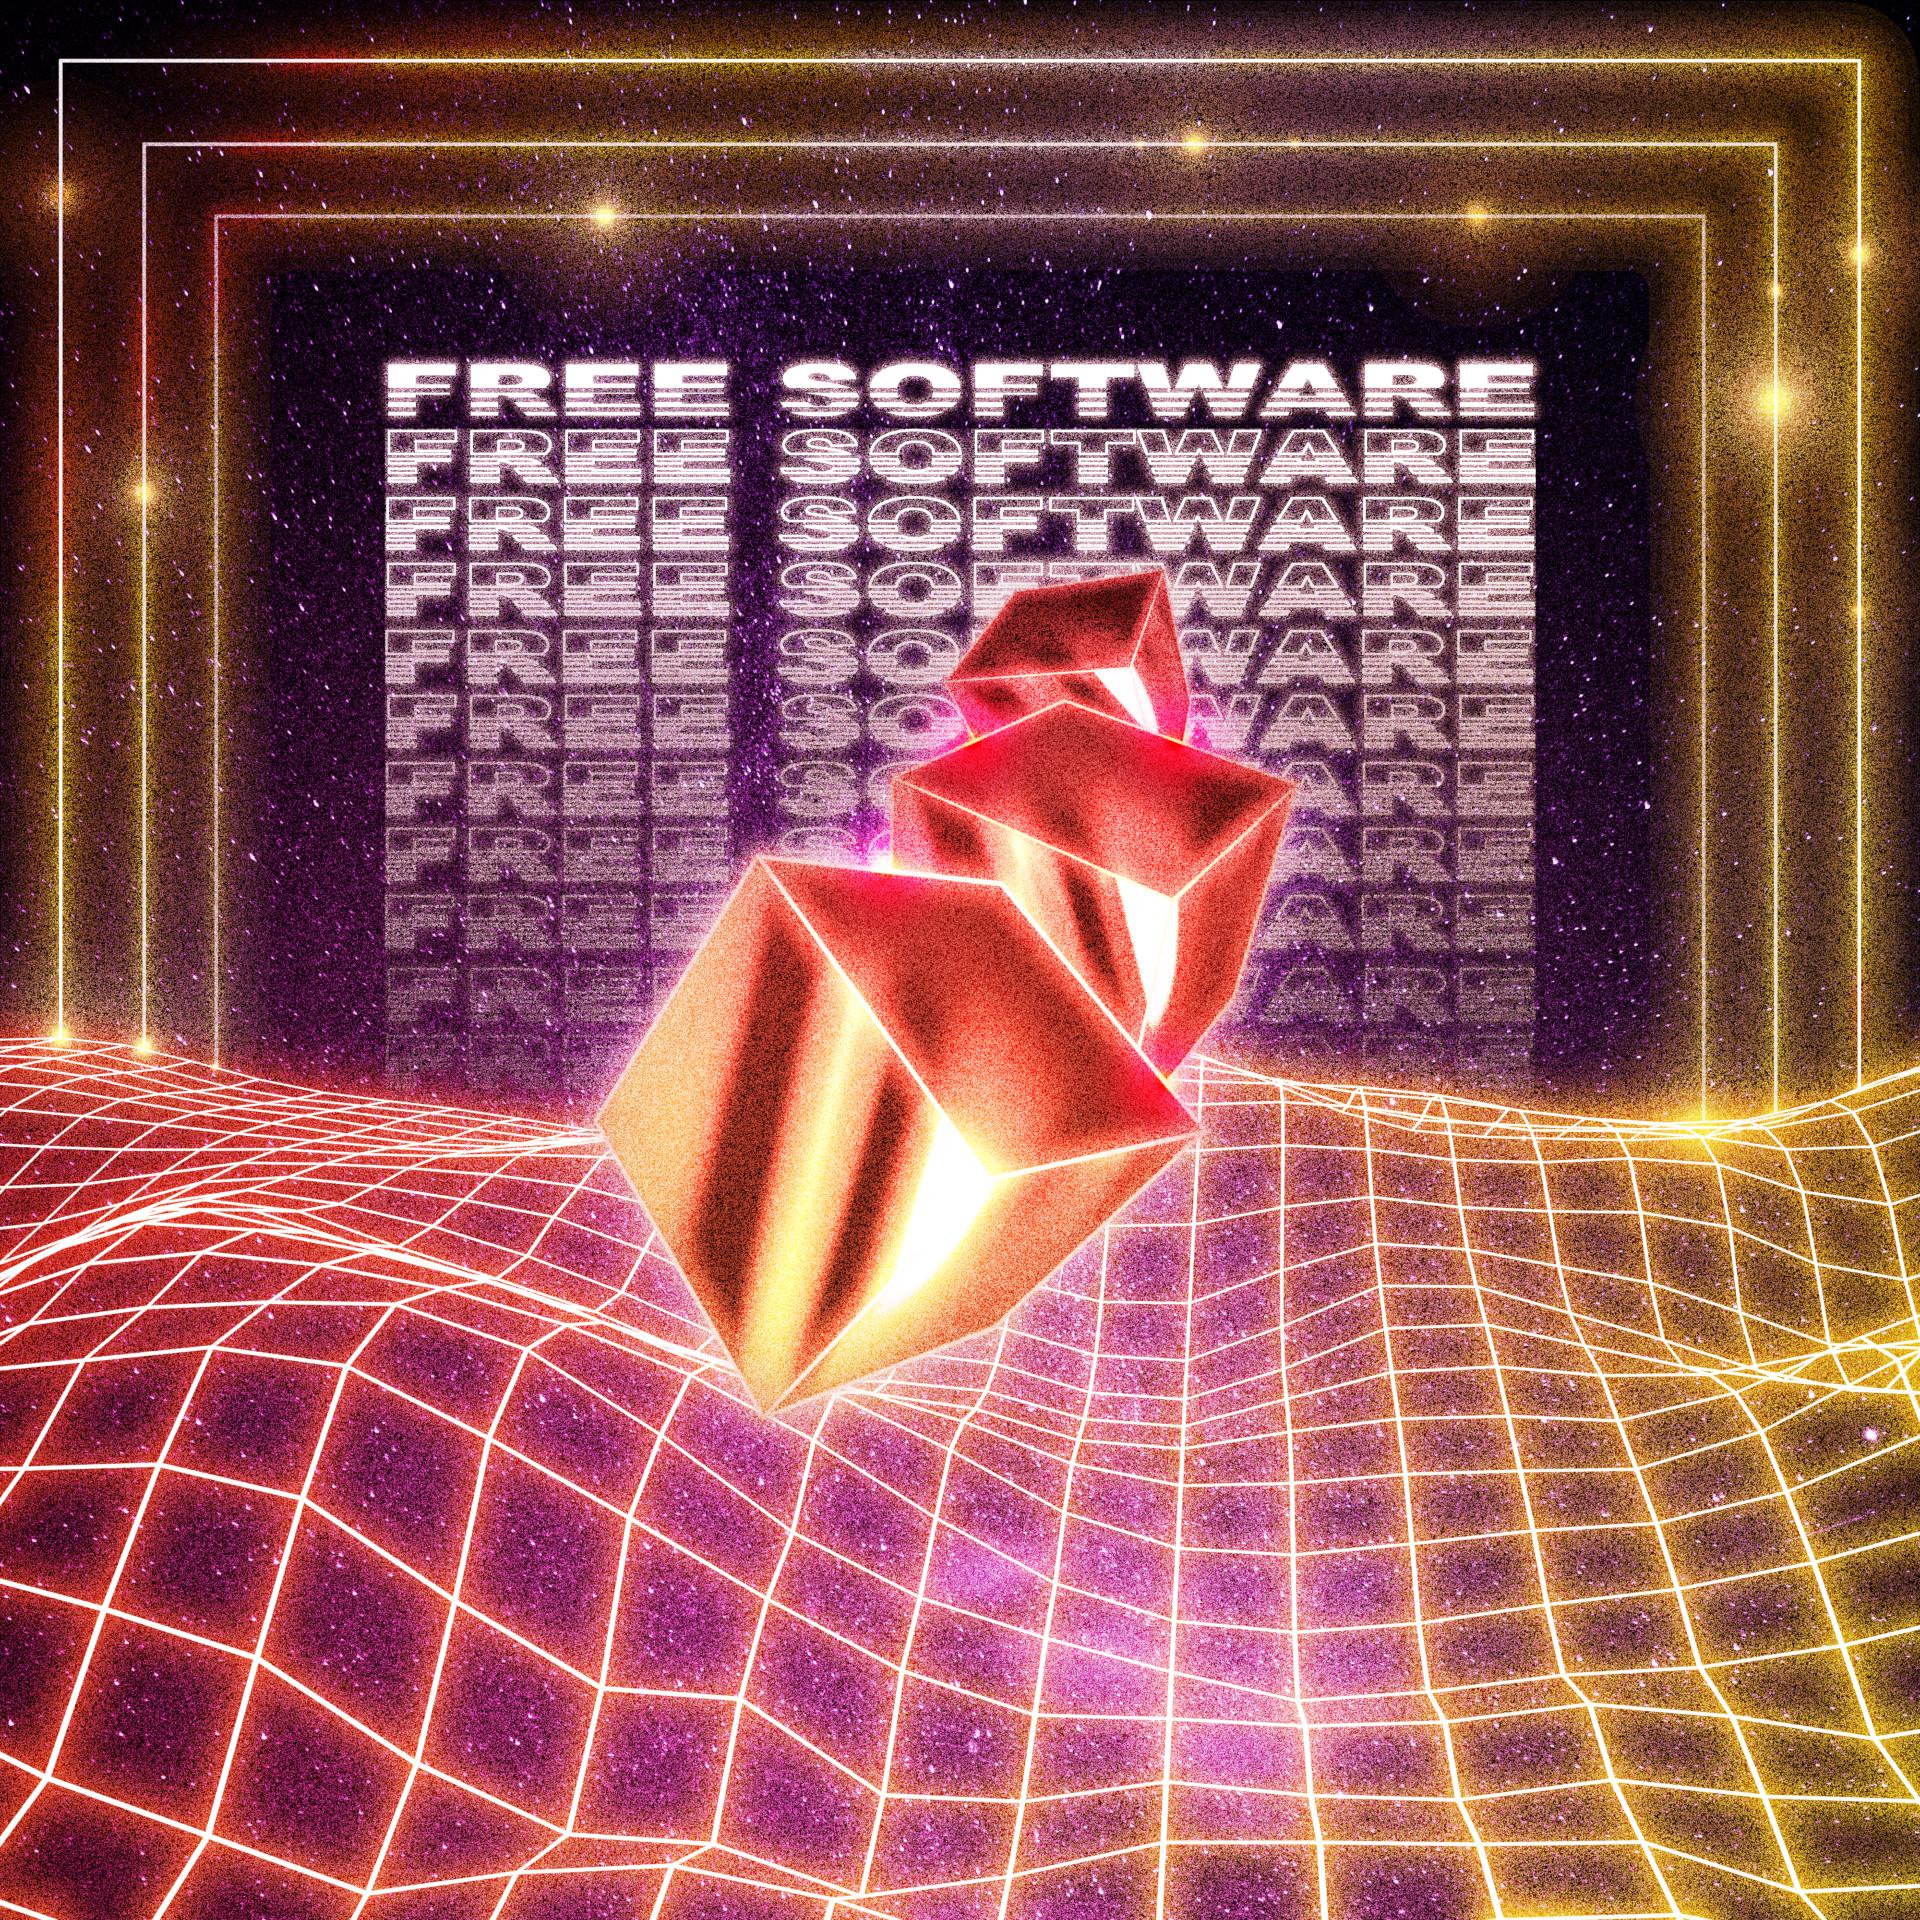 Free Software Brick by Brick